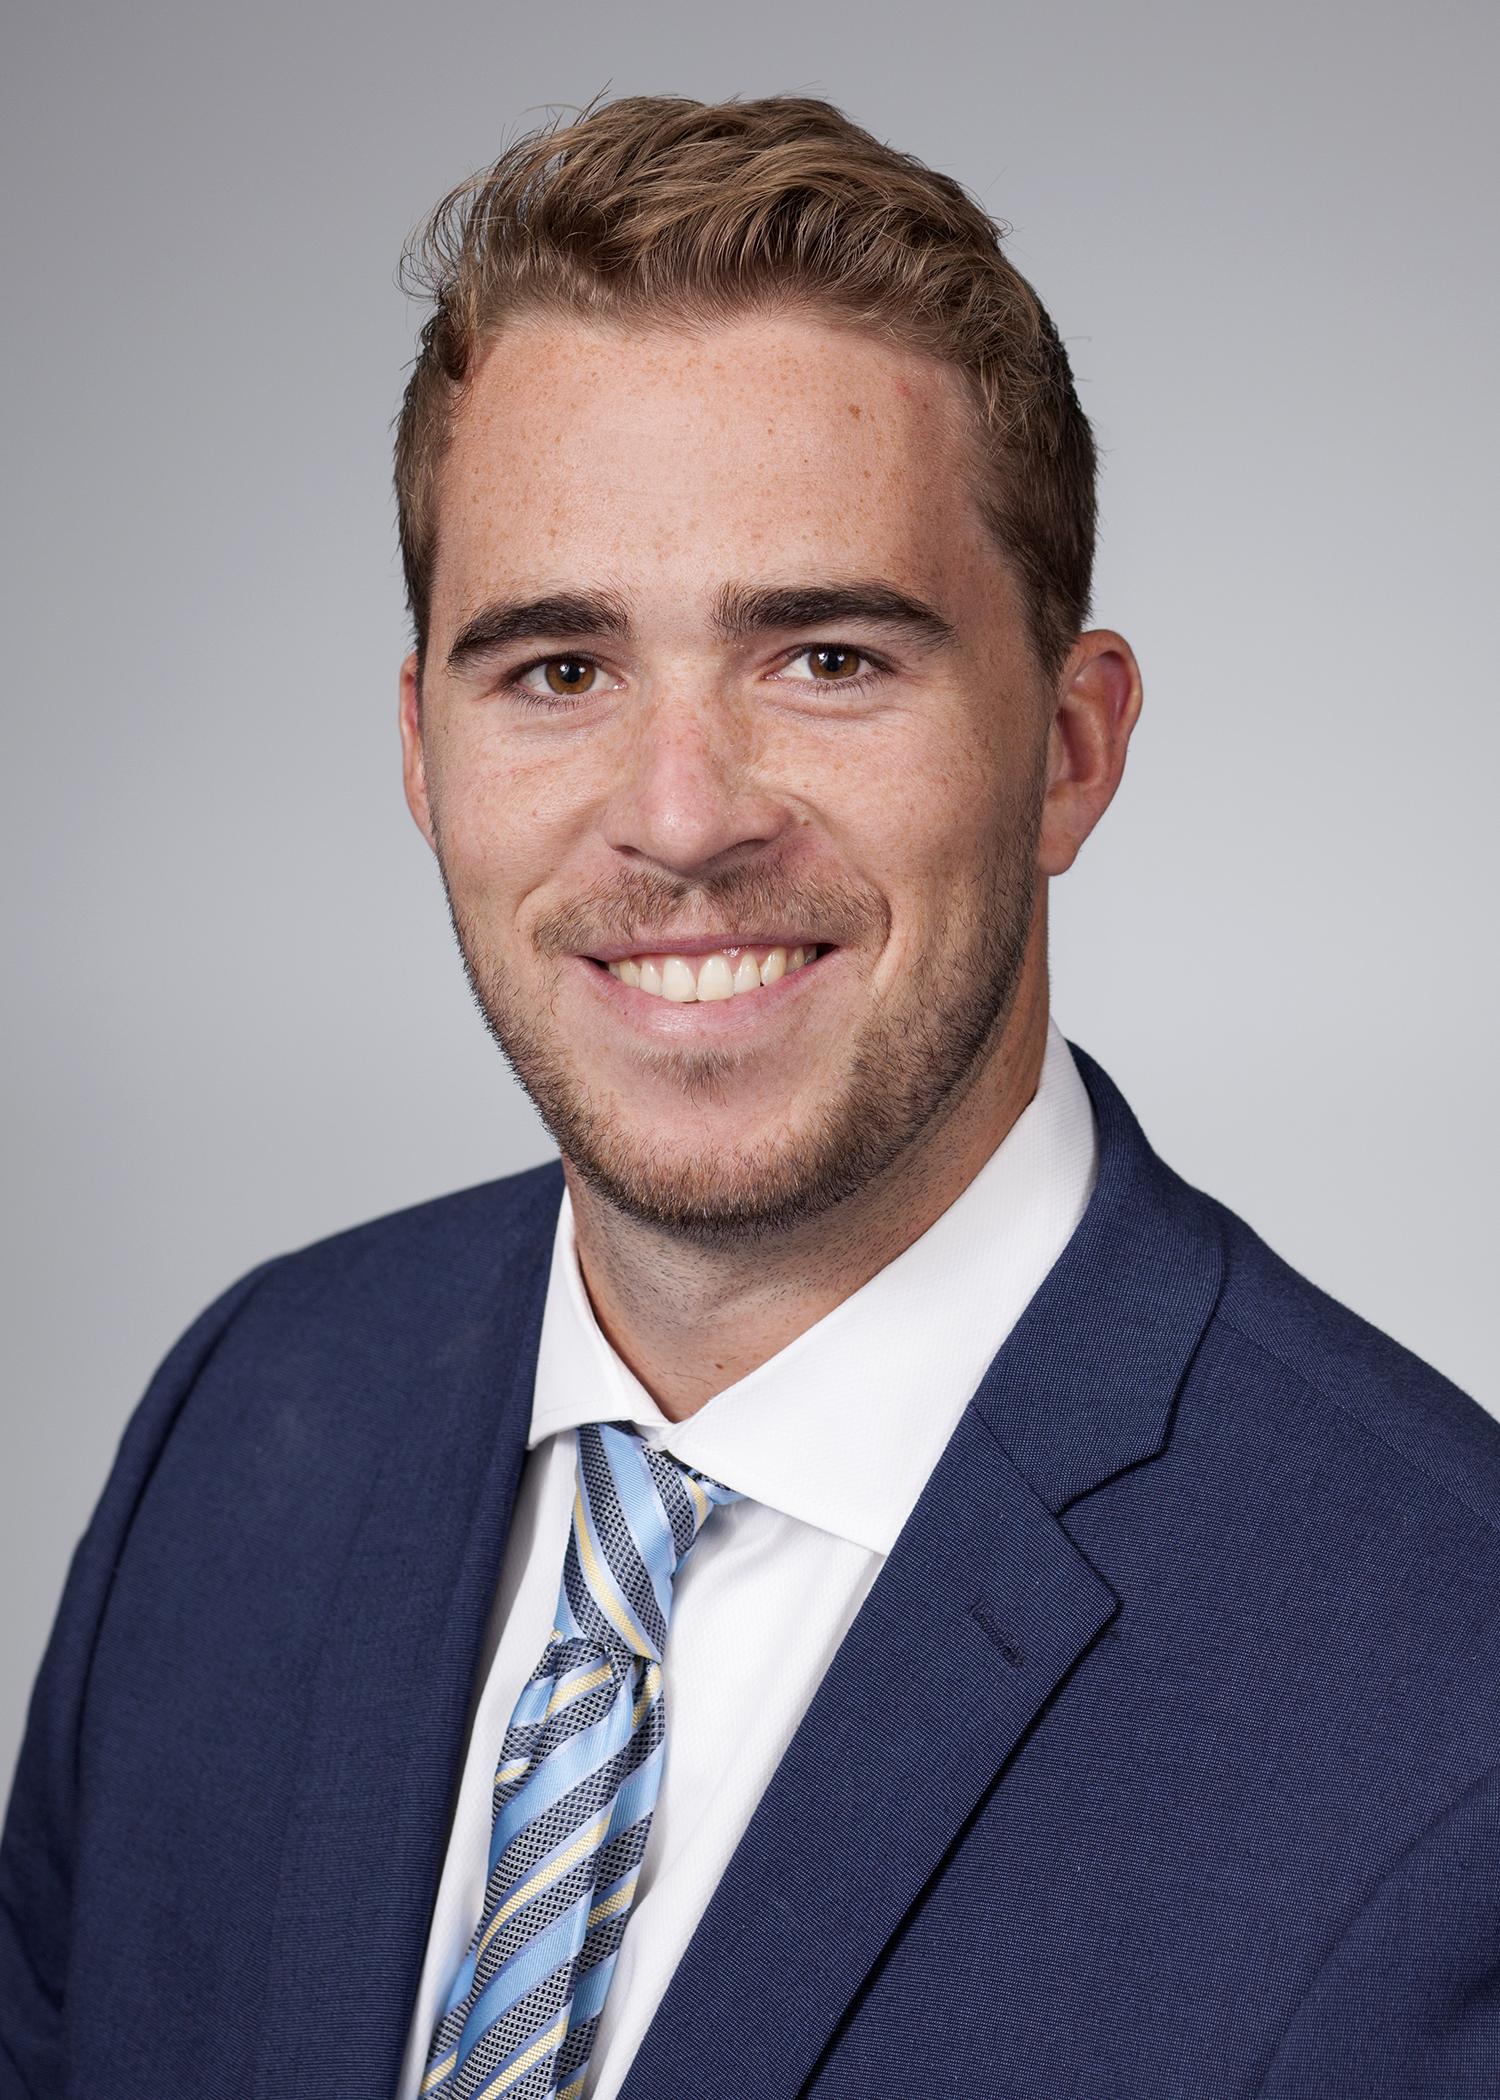 Dr. Joseph Patteson, DMD